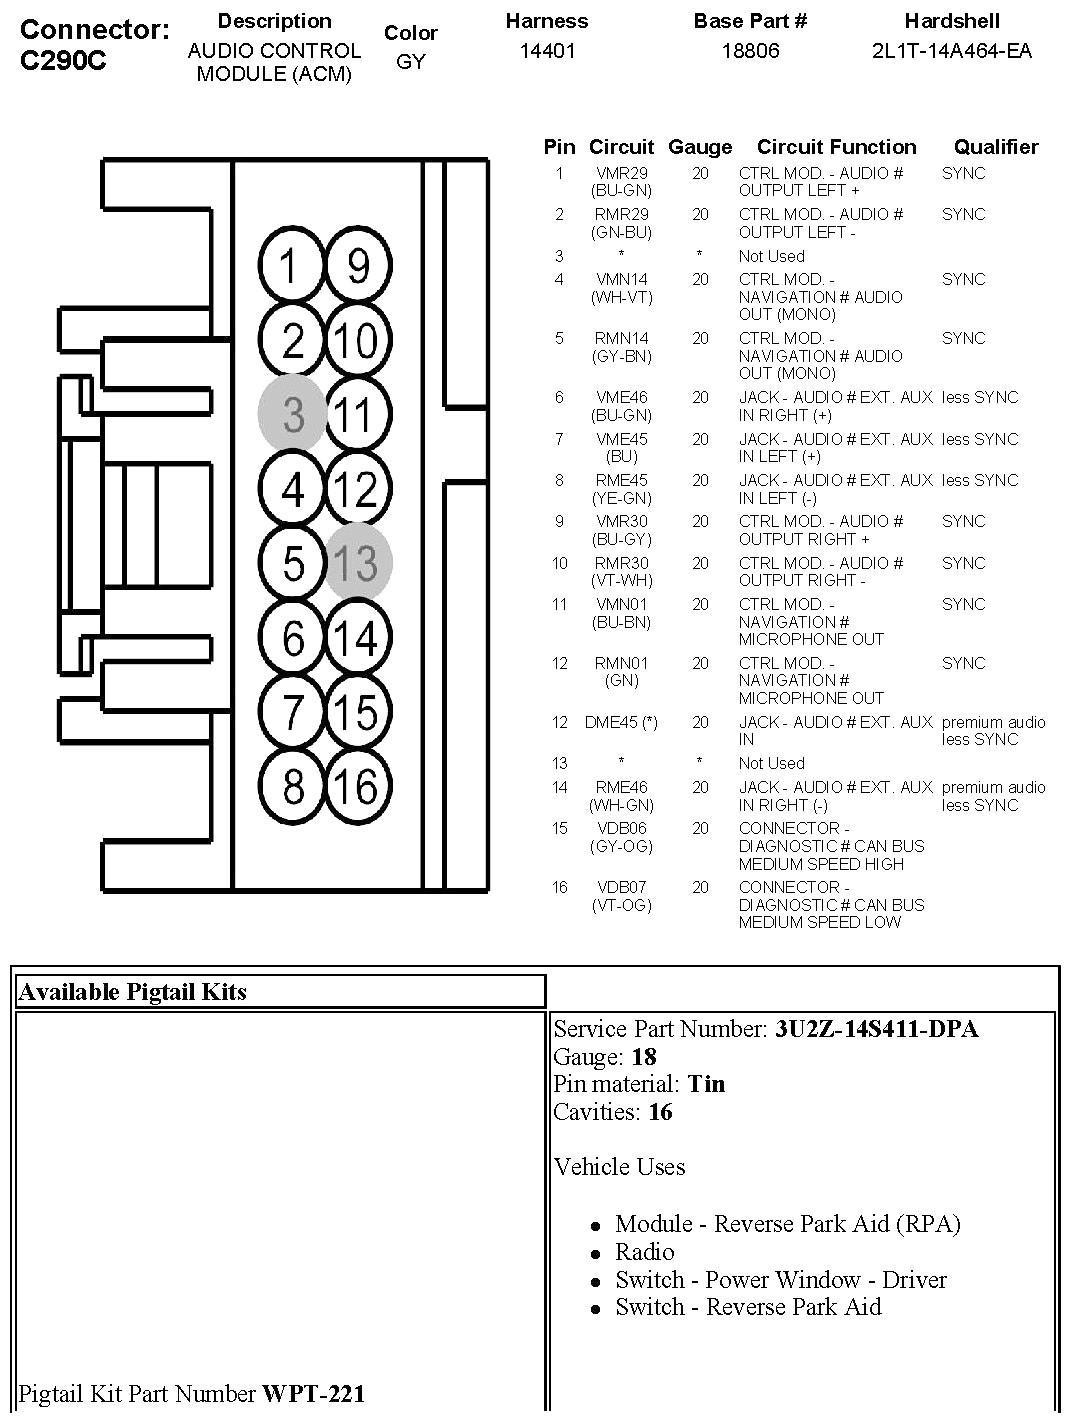 [SCHEMATICS_4LK]  GZ_6417] Radio Wiring Diagram Kenwood Kdc 148 Download Diagram | Kenwood Radio Wiring Schematic |  | Diog Kesian Illuminateatx Librar Wiring 101